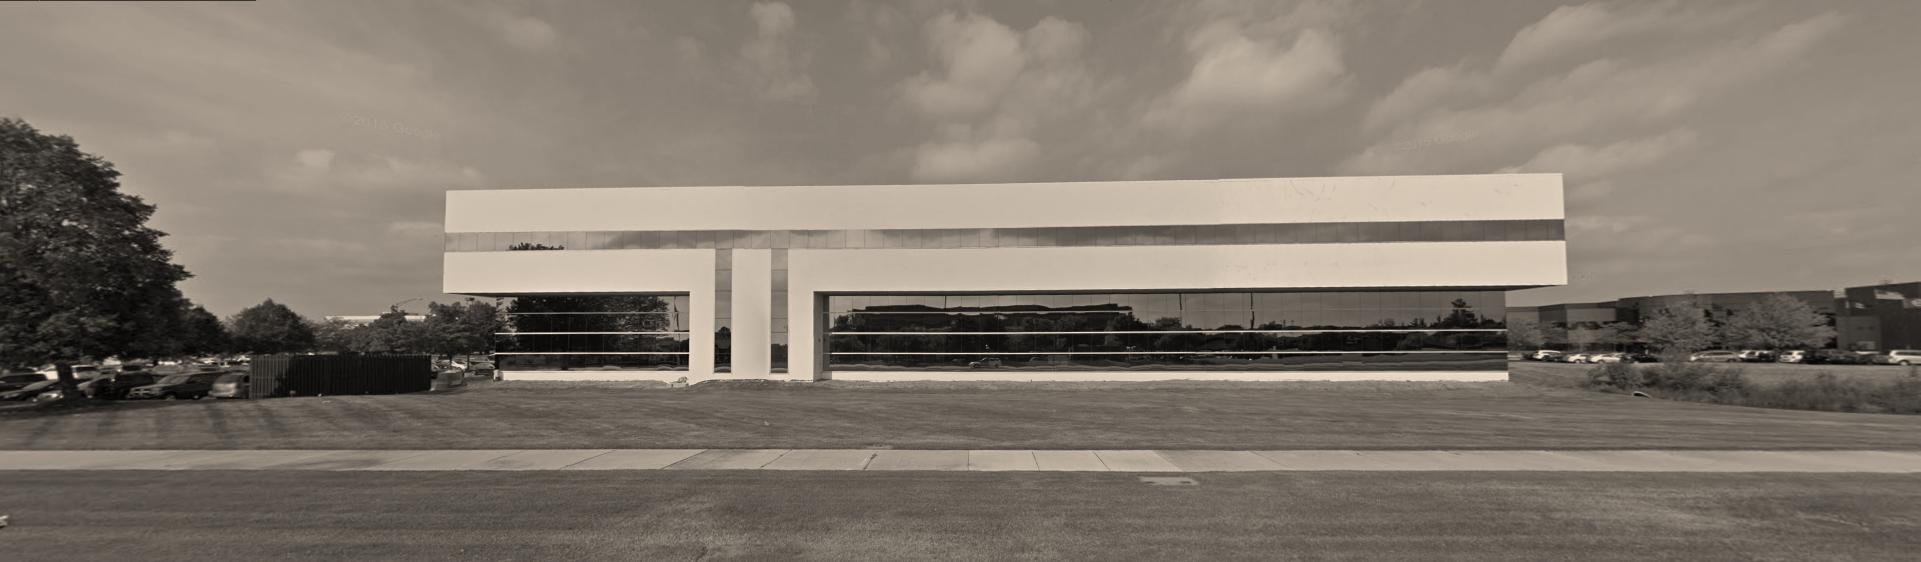 DCS Office Building